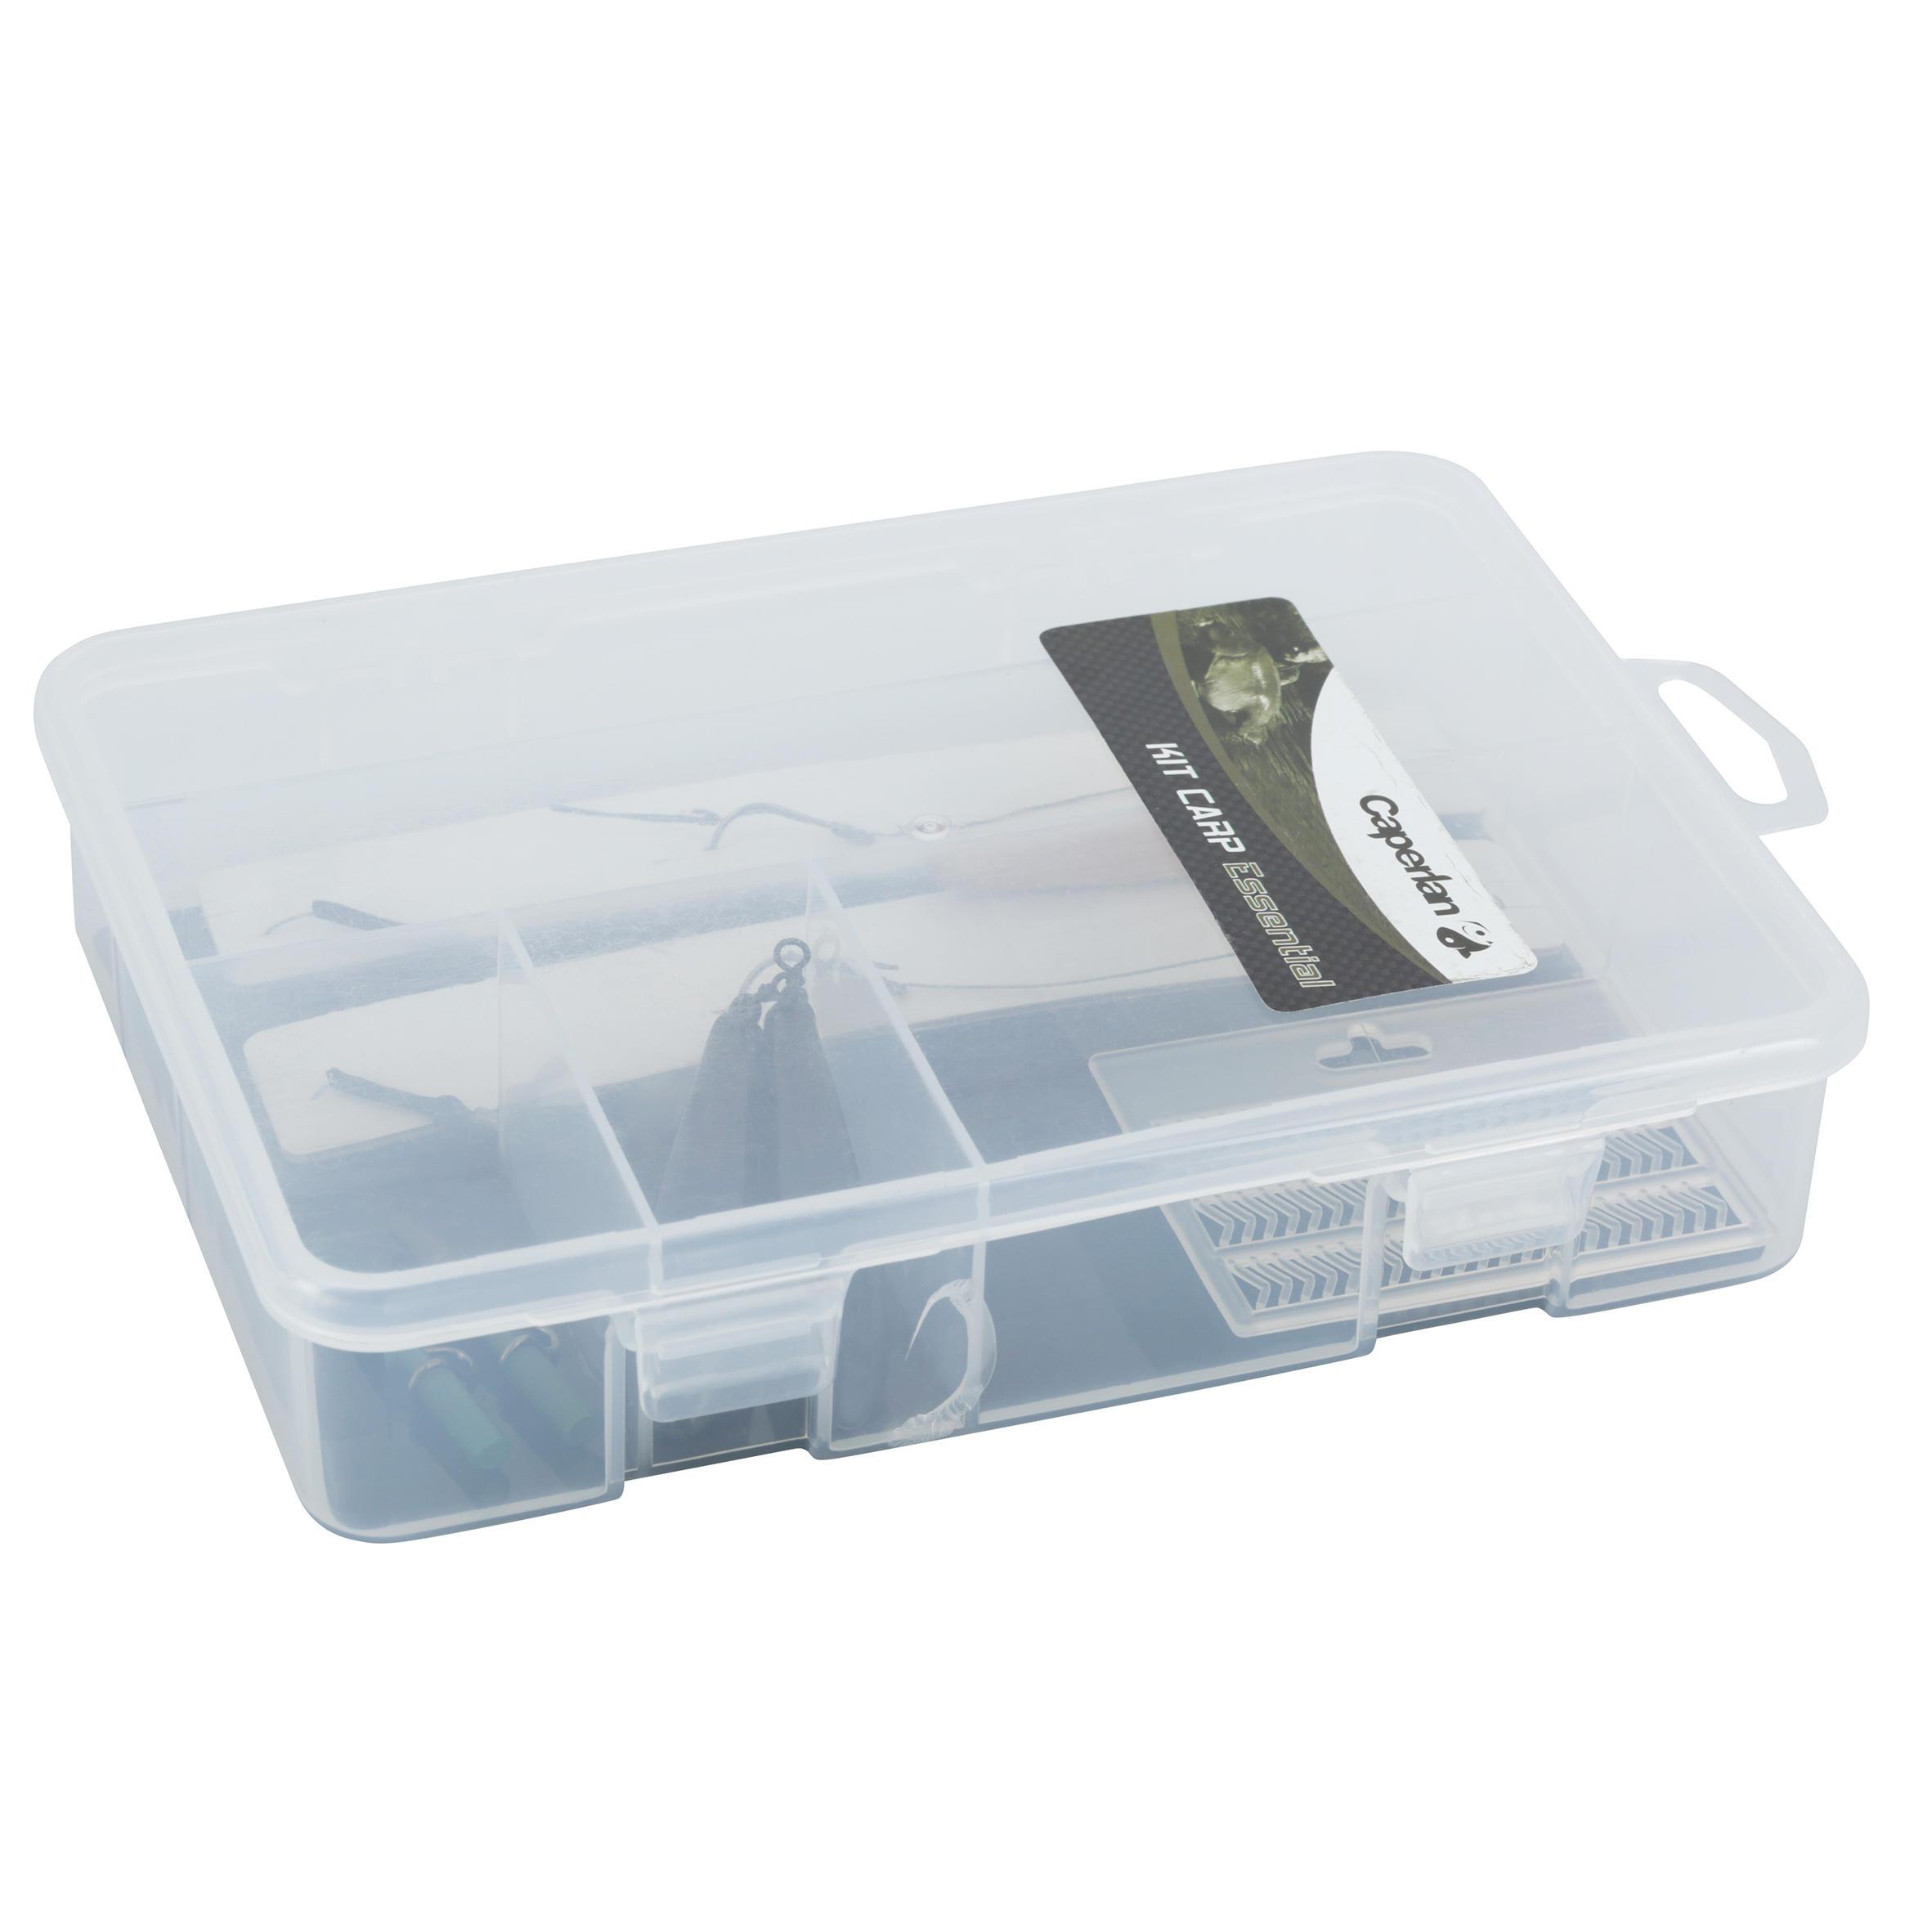 Essential carp fishing kit